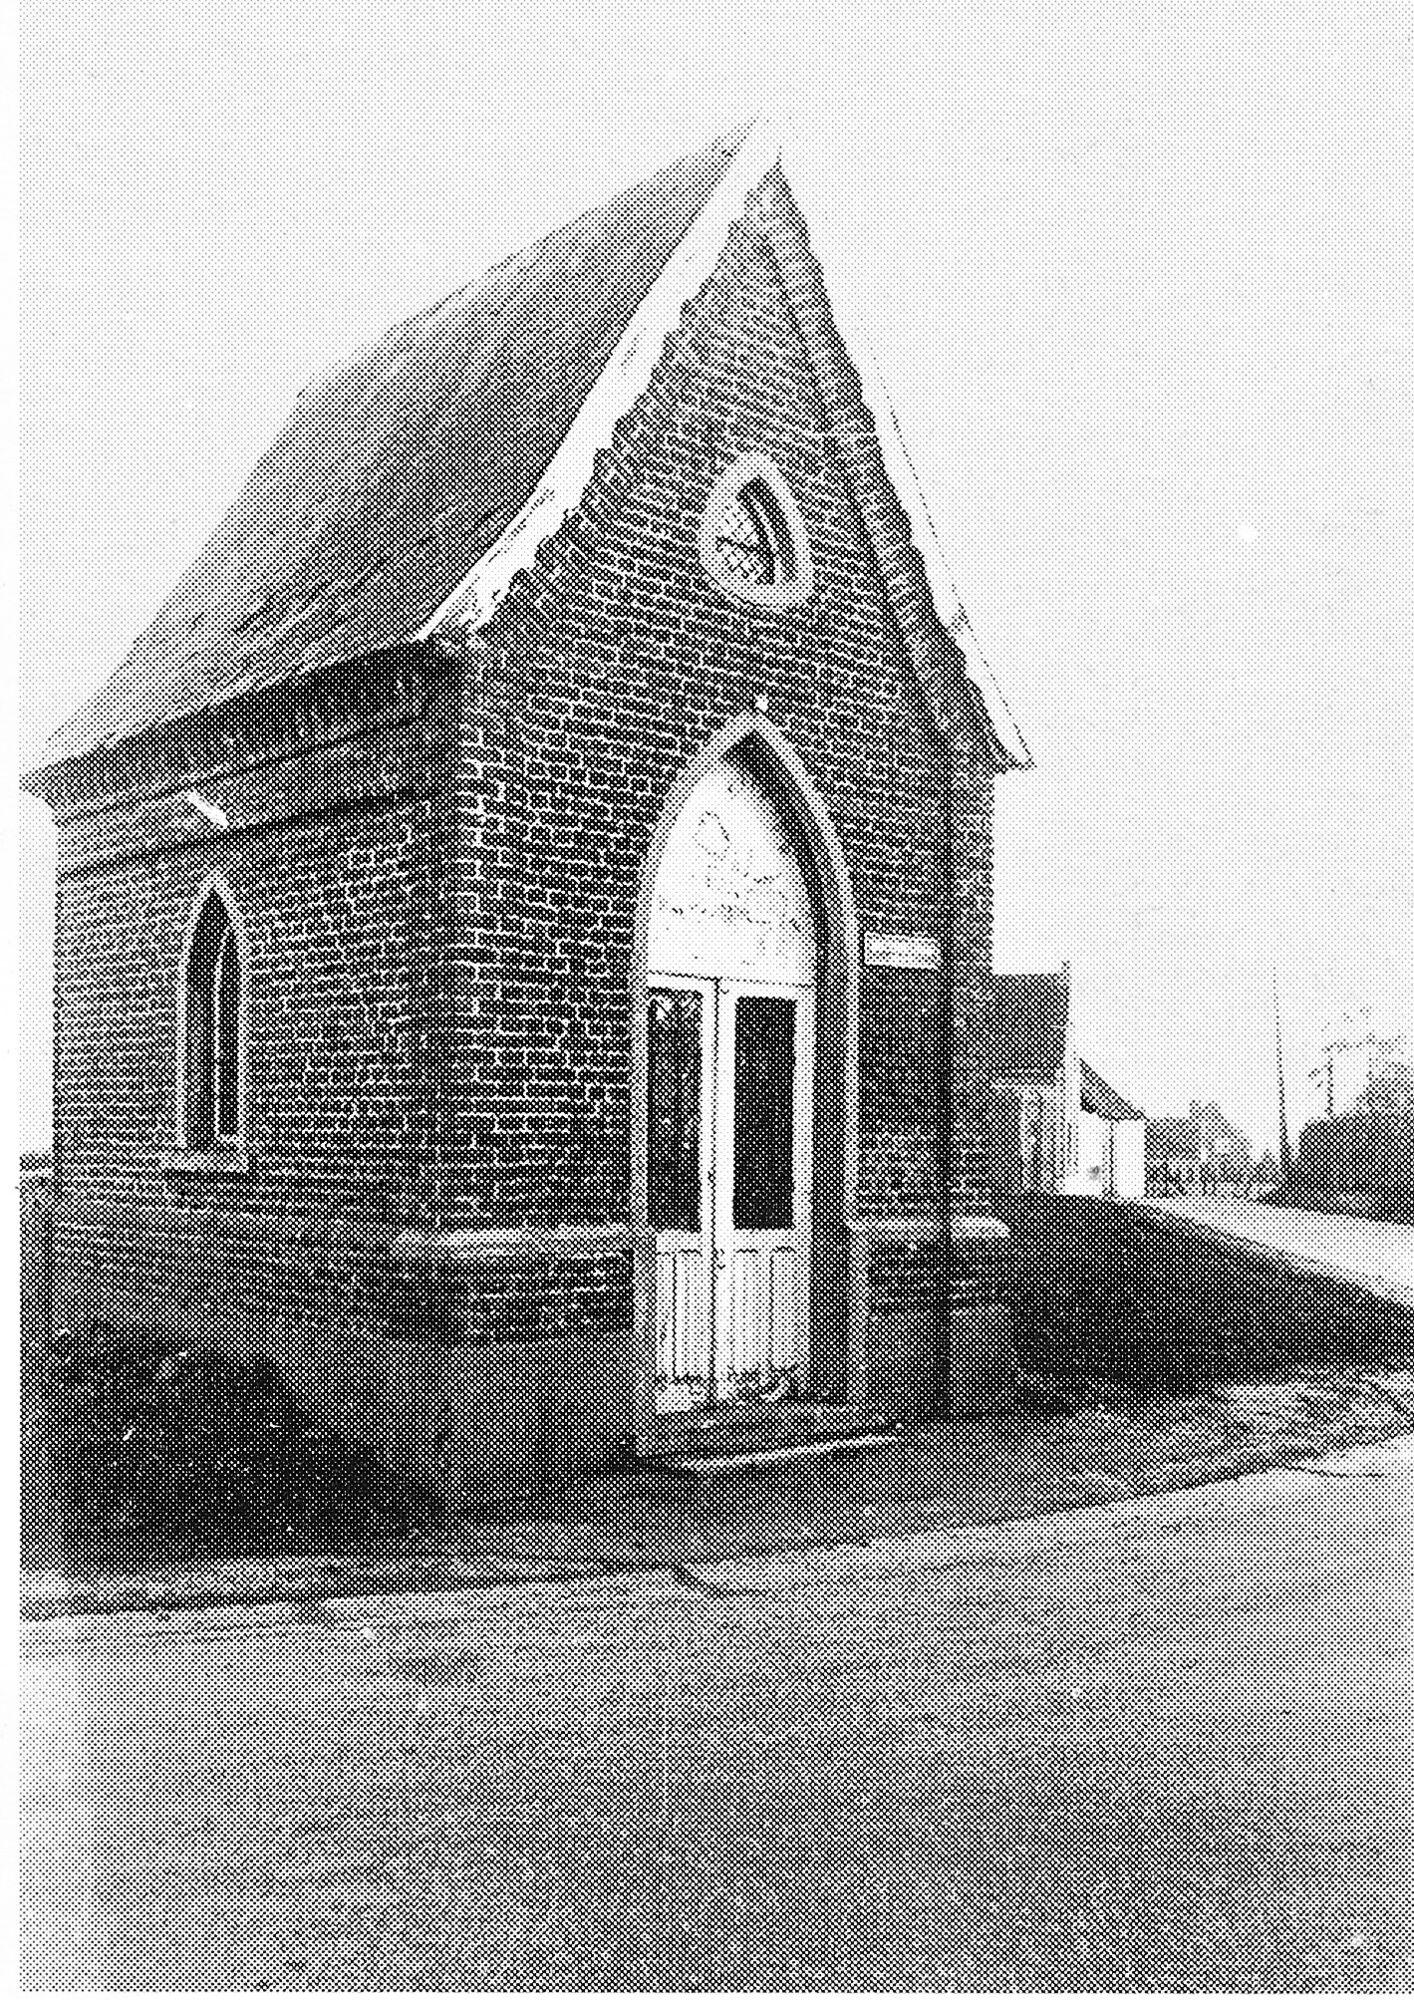 Kapel Muizenhol Deftinge